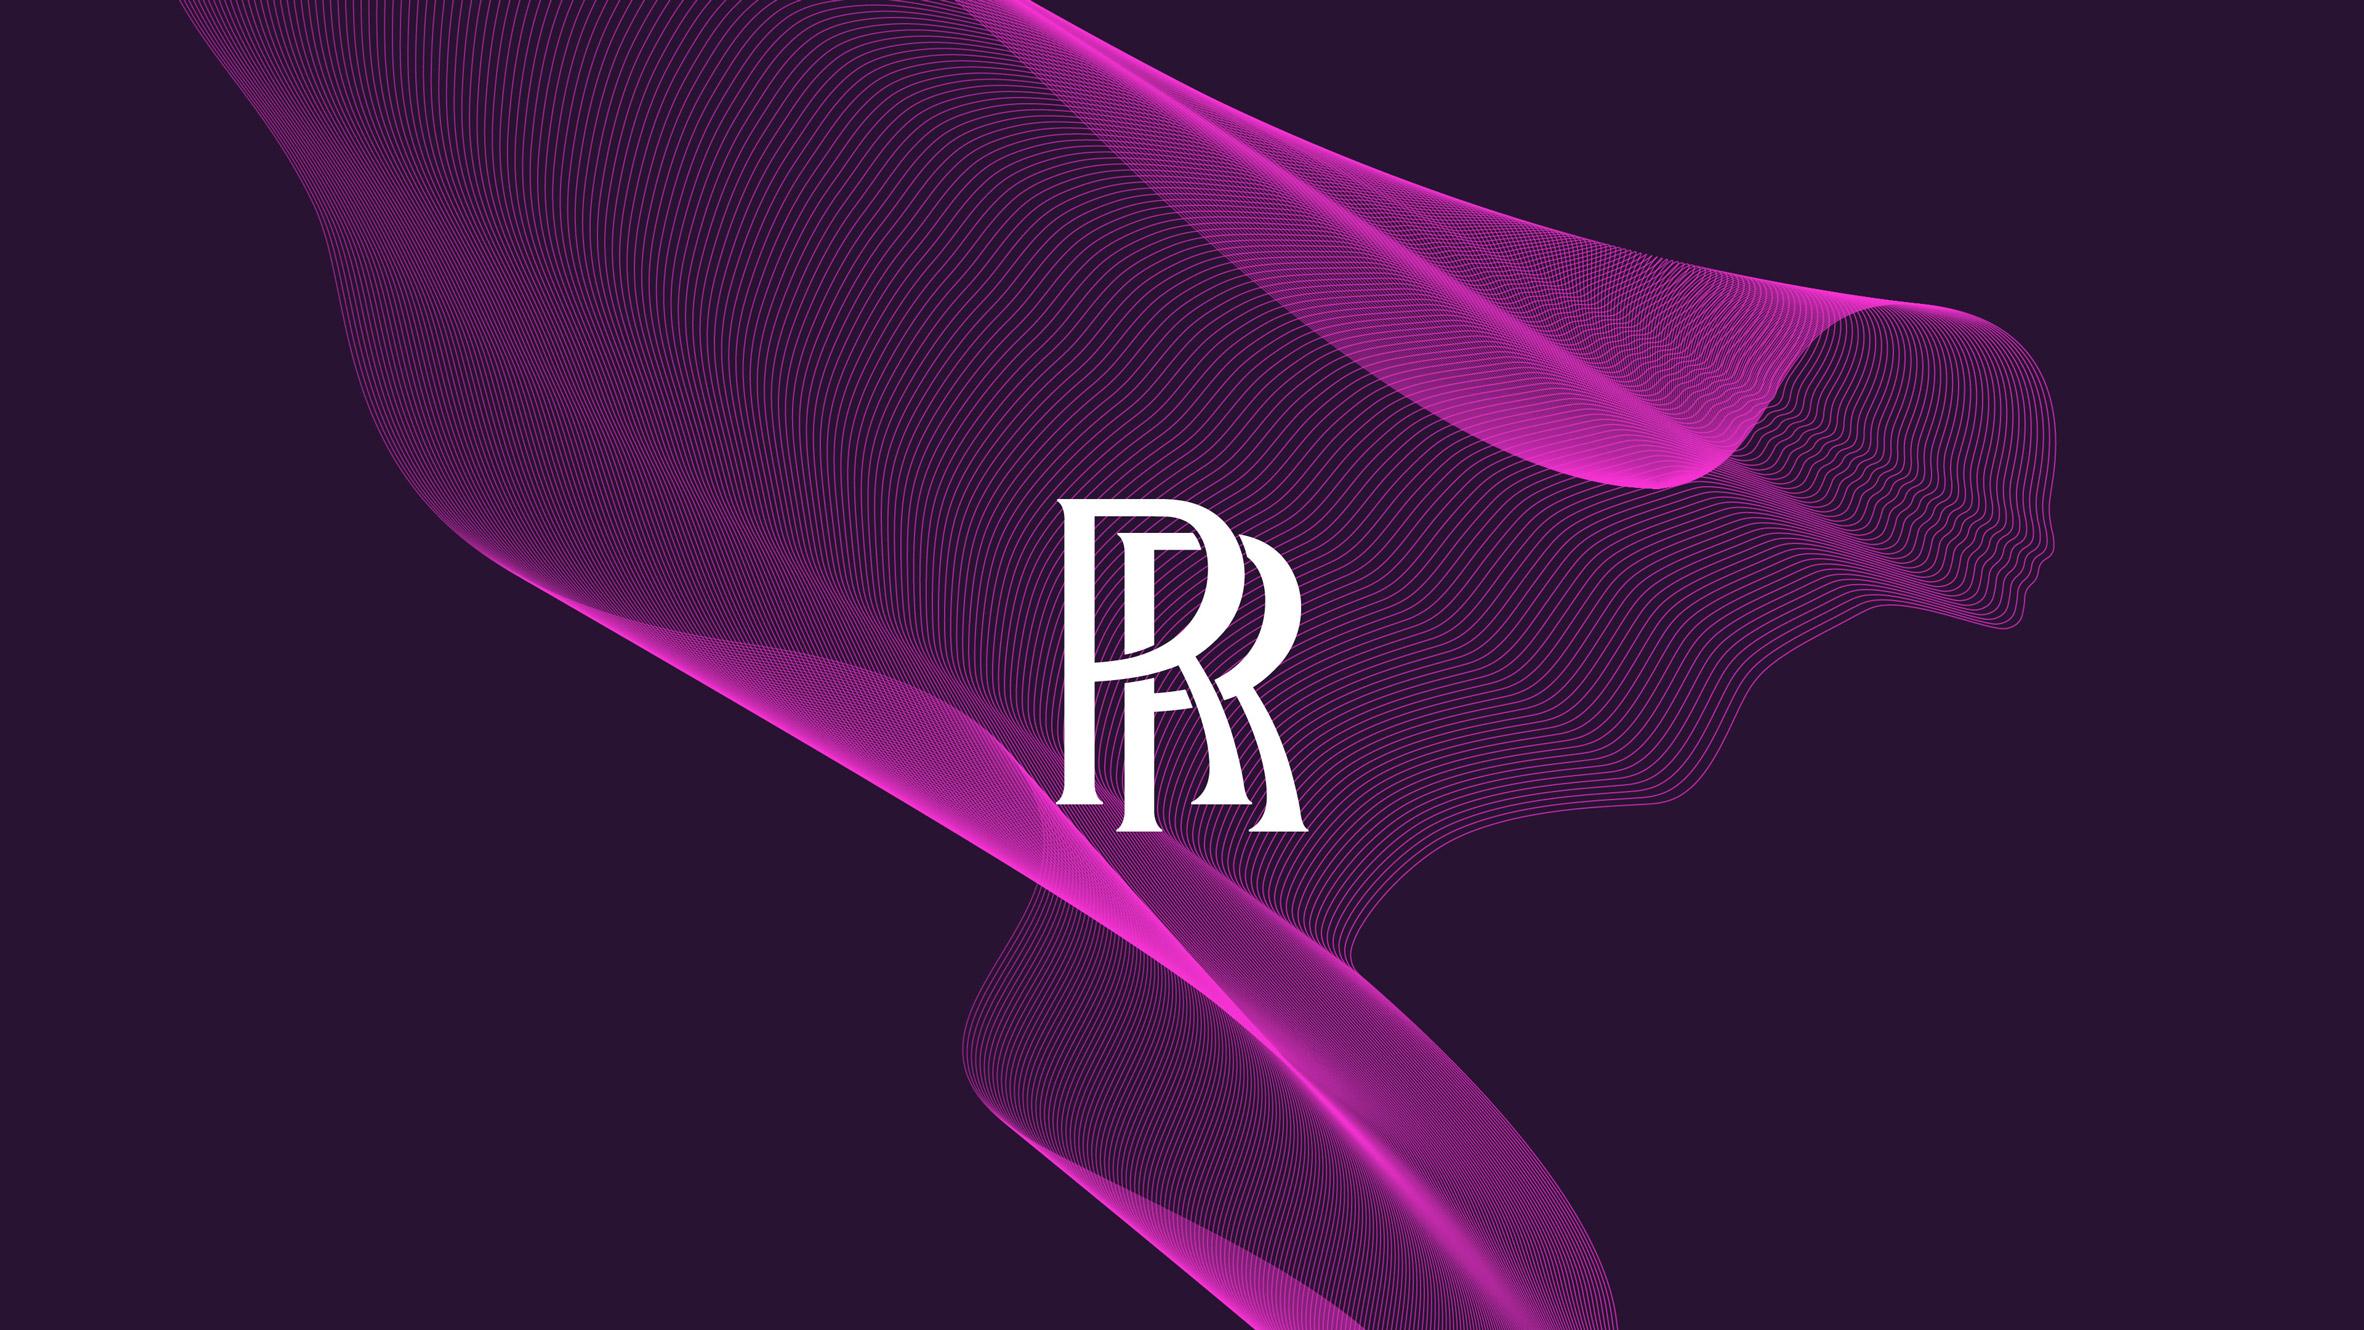 Rolls Royce Unveils Confident But Quiet Rebrand By Pentagram